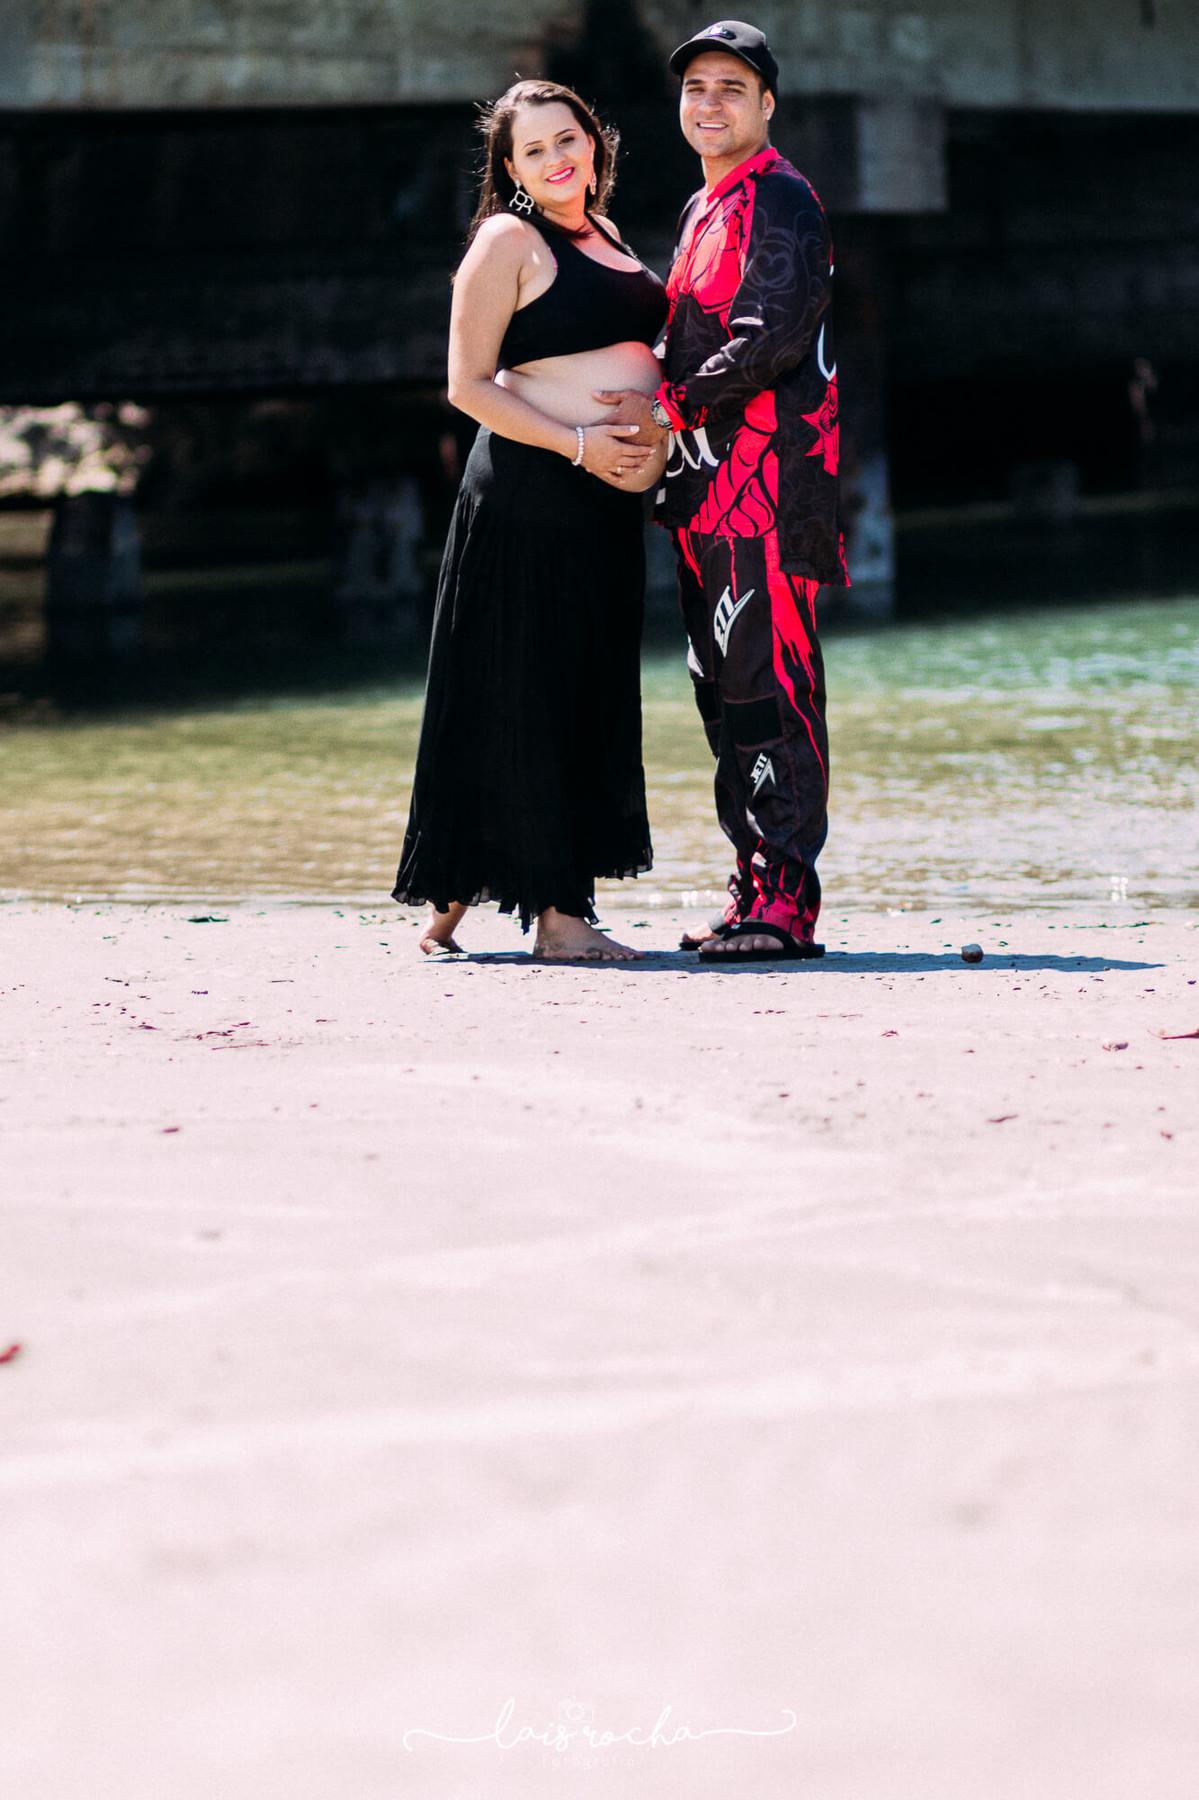 Ubatuba - ensaio gestante - gravida - fotografia - lais rocha fotografia - mamae - baby - girl - isabella